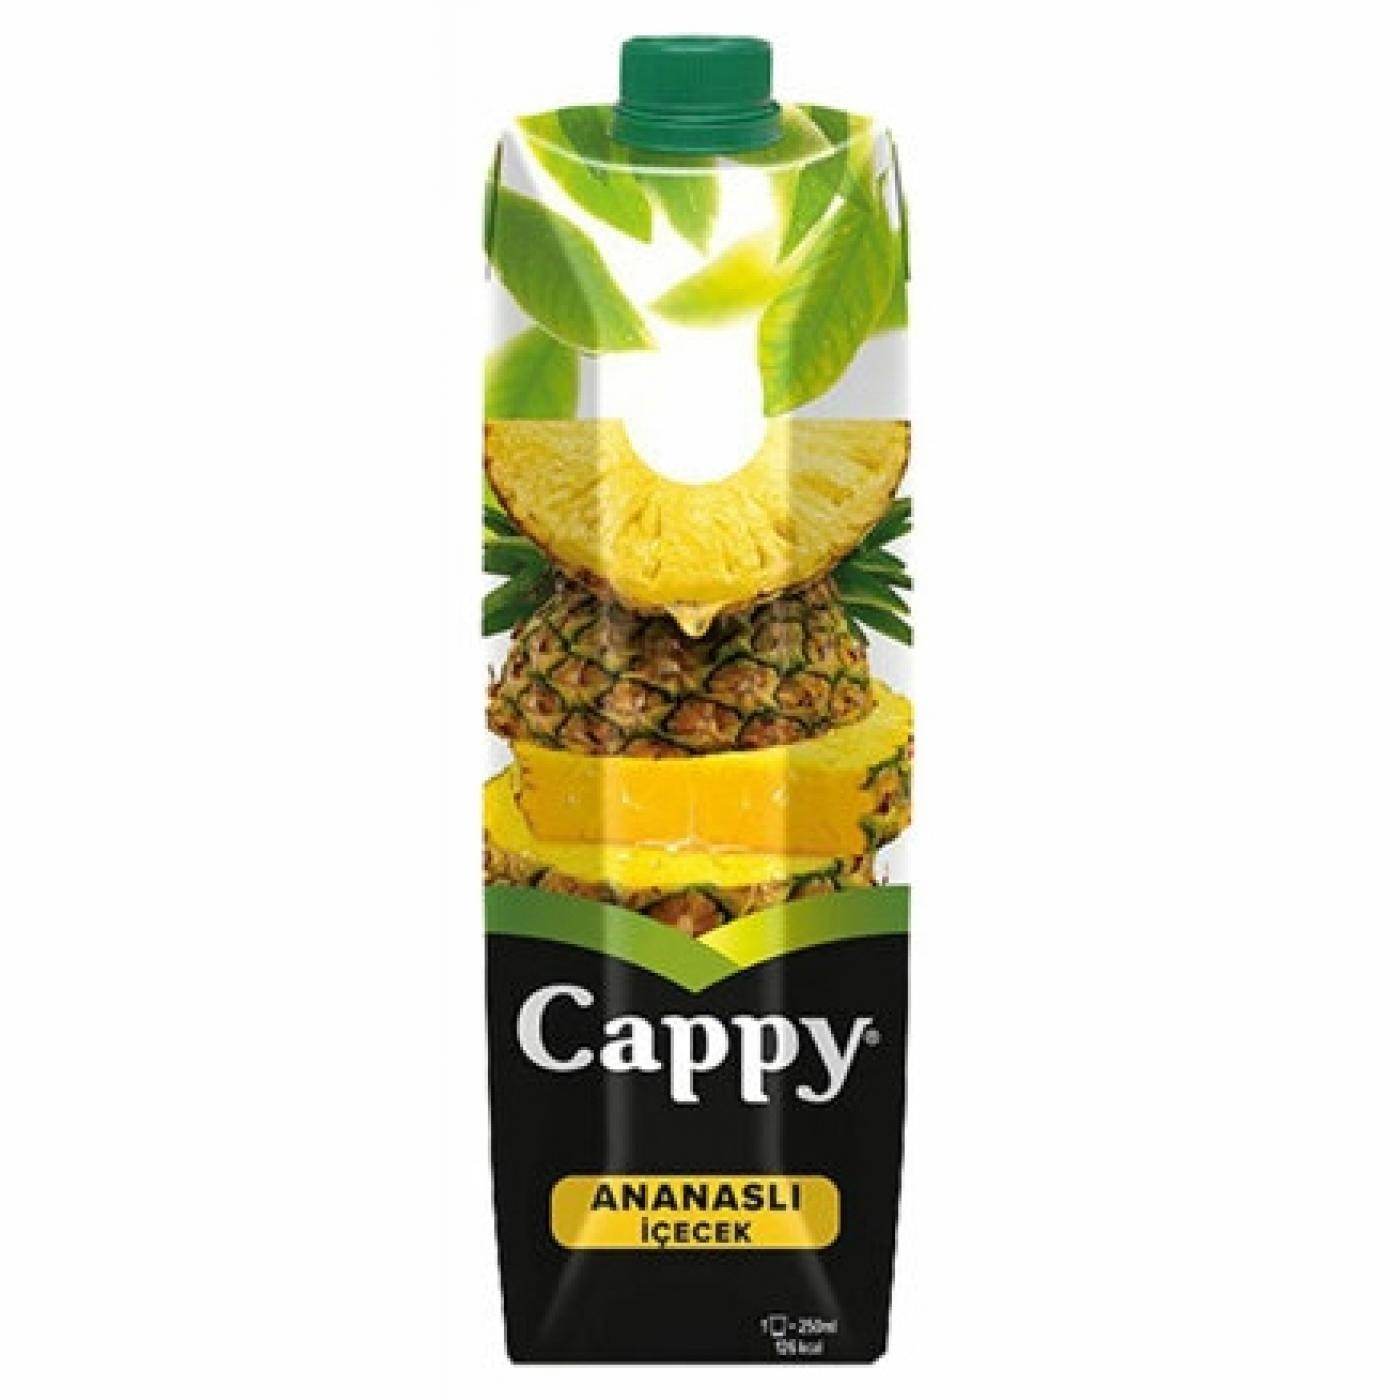 CAPPY 1LT ANANAS